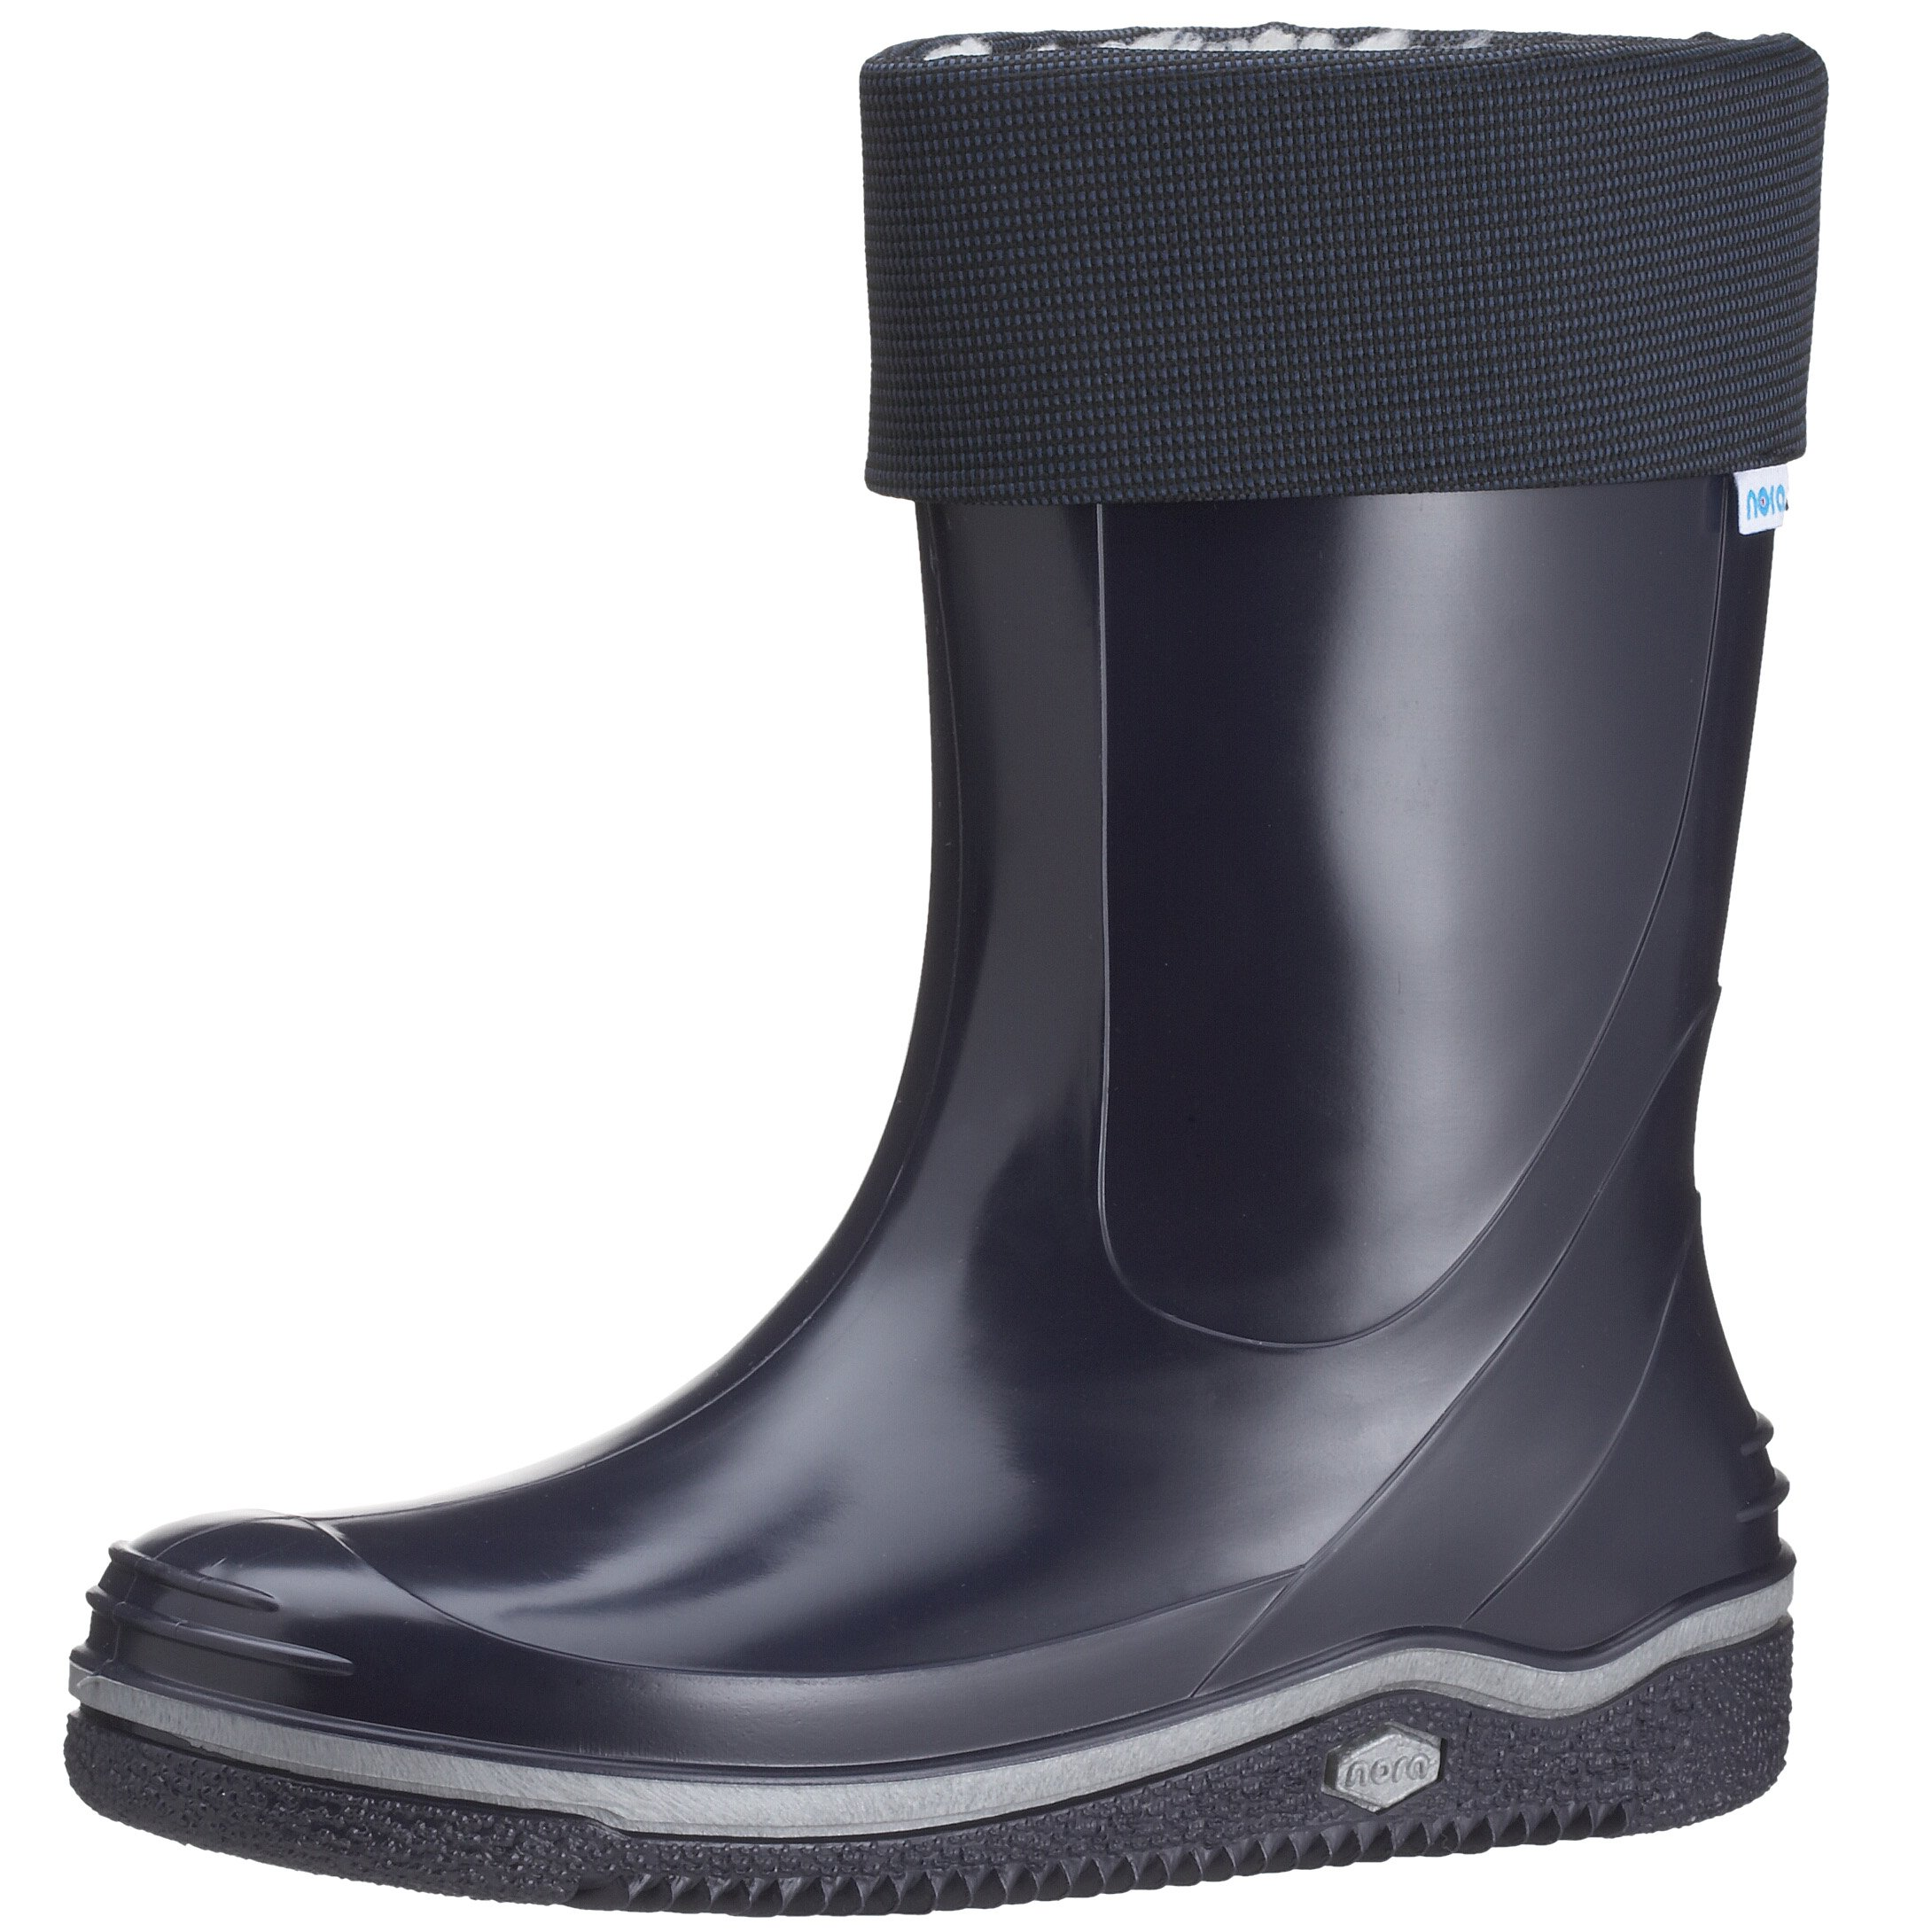 Nora boys rain boots blue size 38 EU by Nora